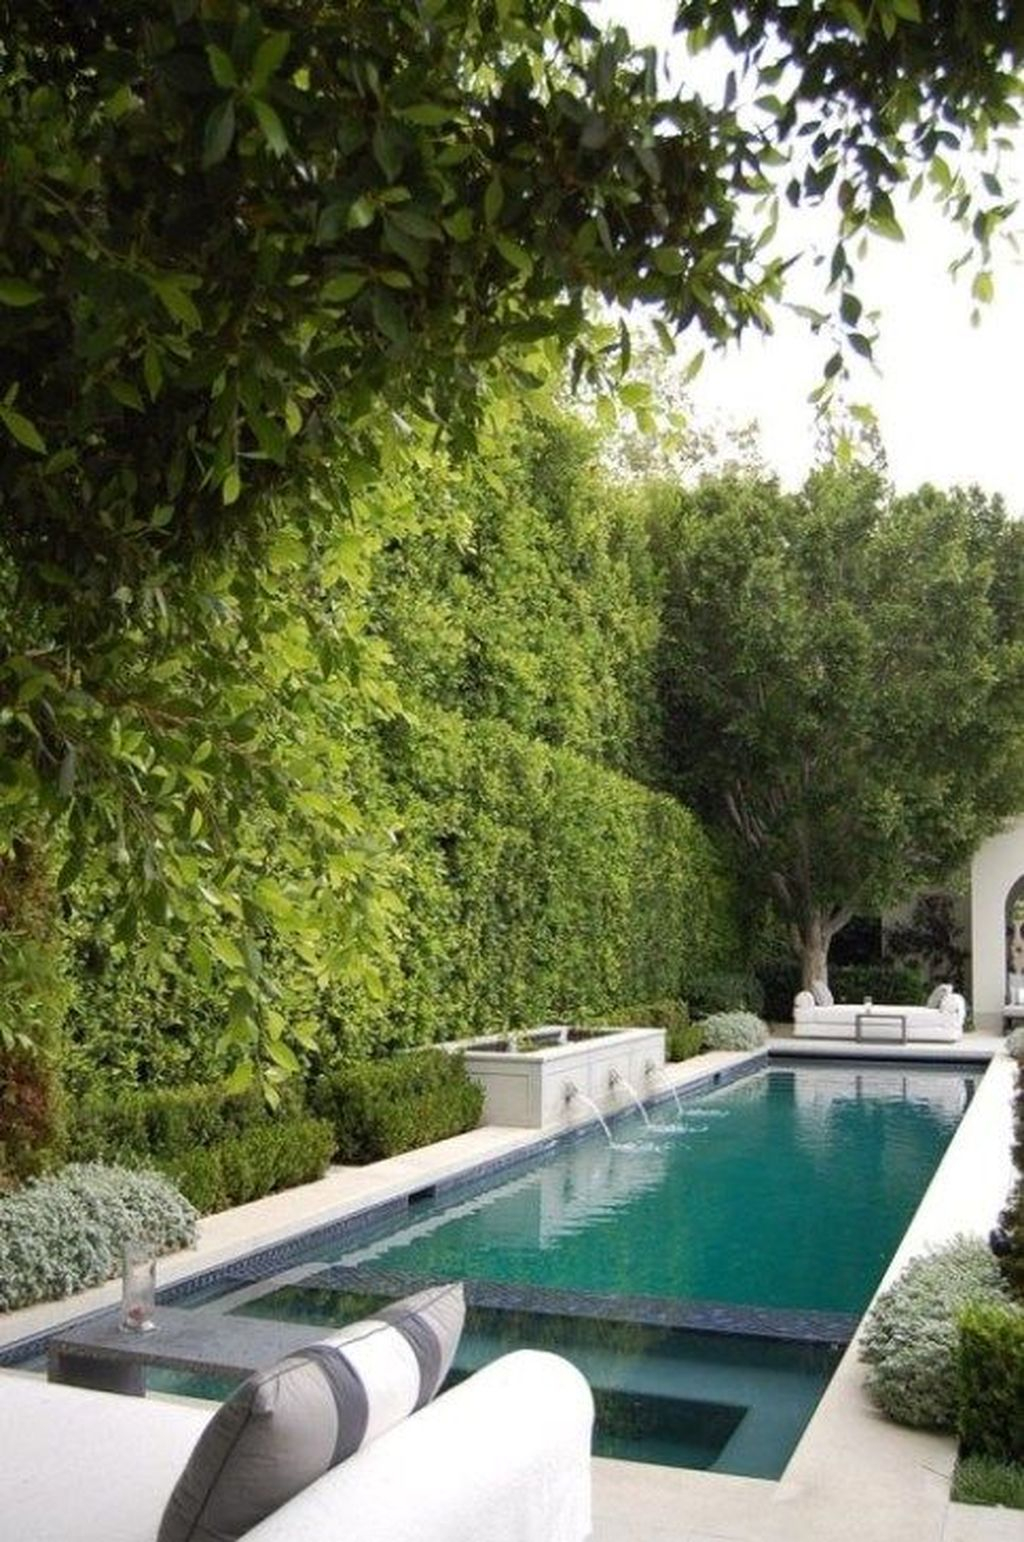 Awesome Backyard Patio Ideas With Beautiful Pool 04